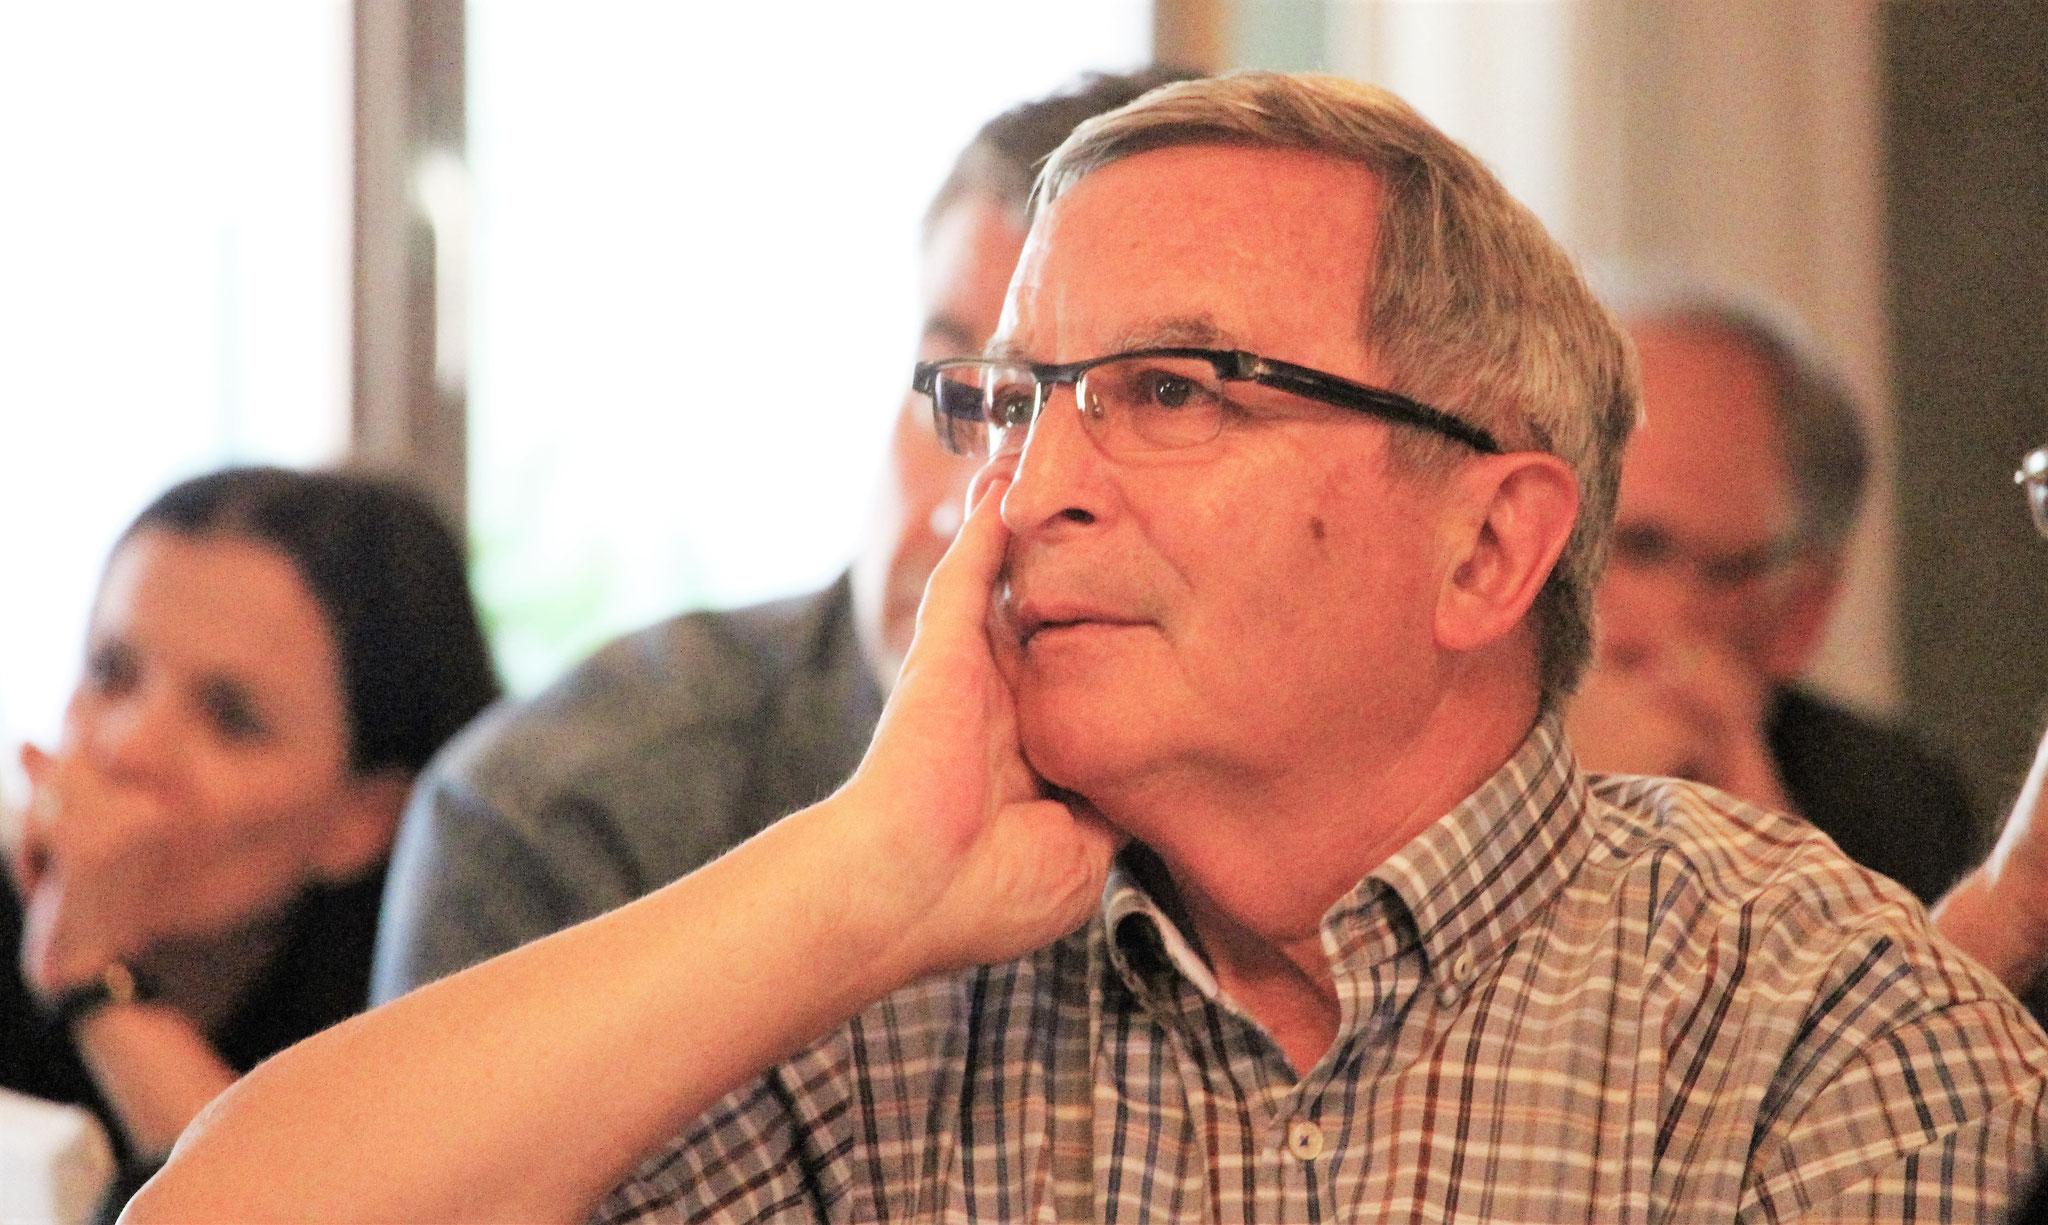 Revisor Fritz Keller (Fulenbach) verfolgt die Hauptversammlung.